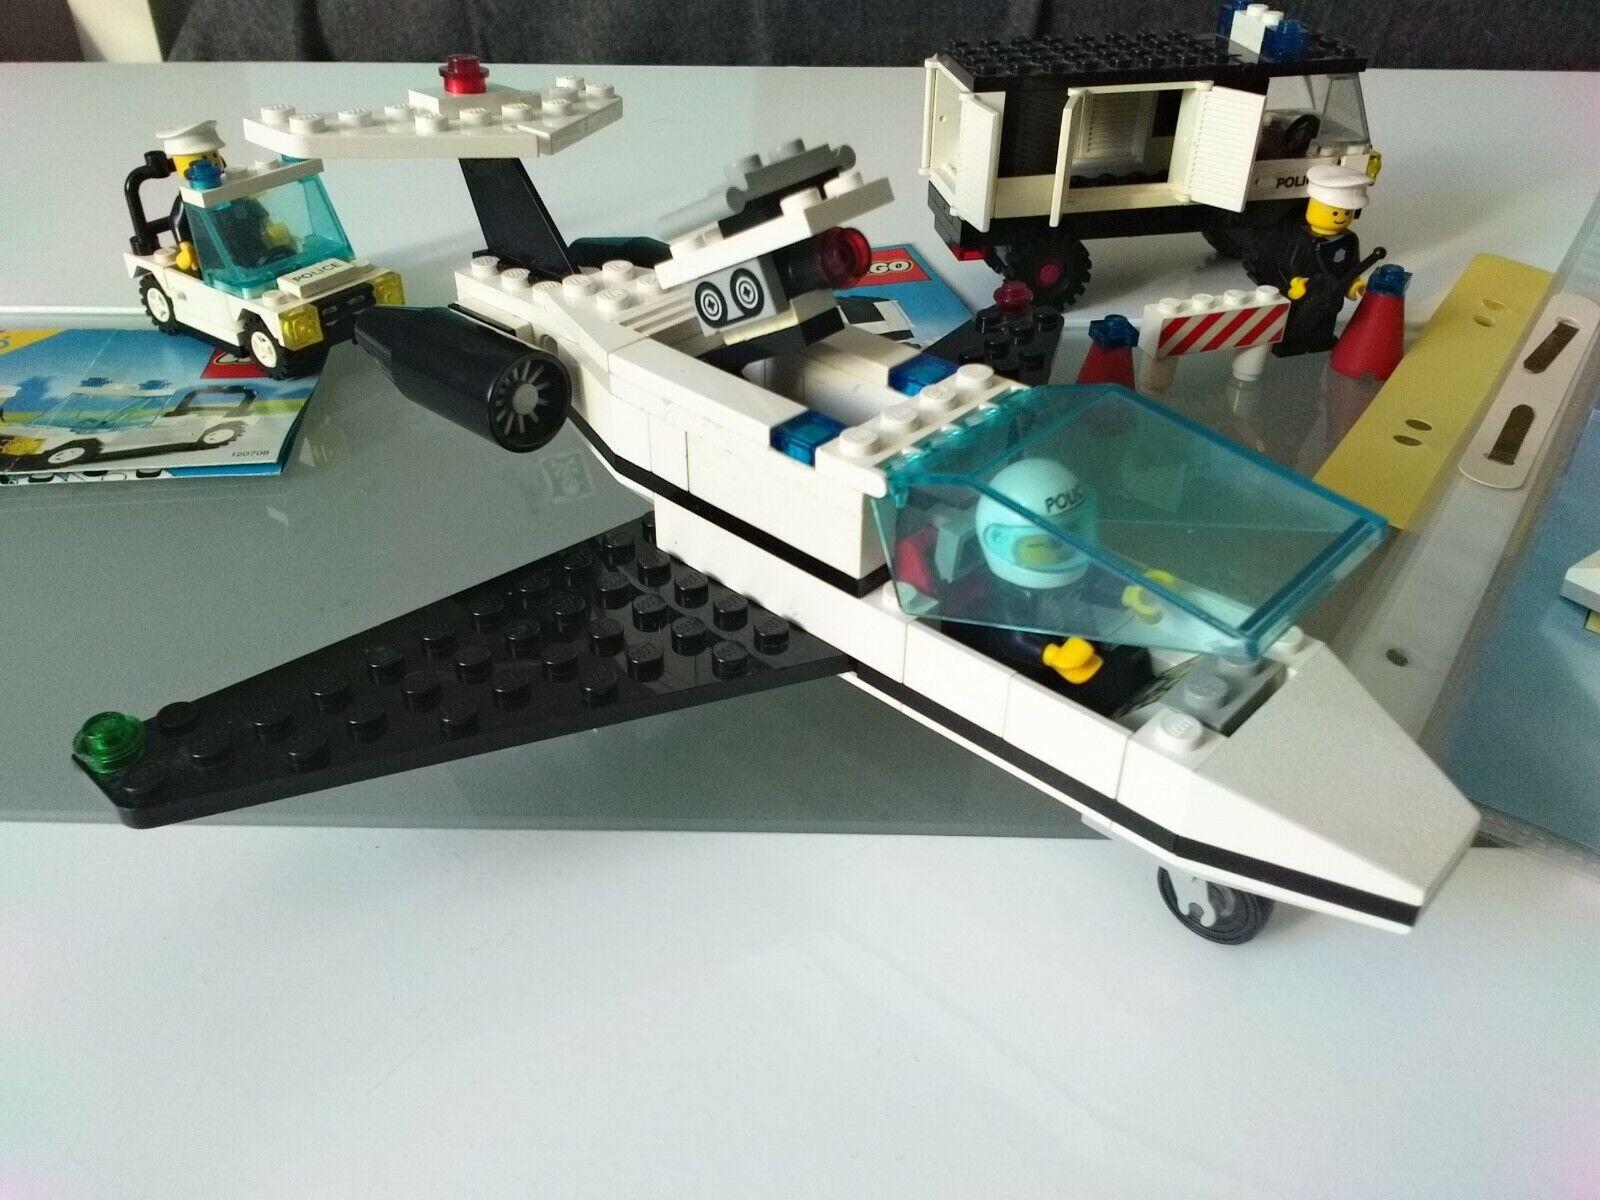 Lego Polizeiset 6344 6681 6681 6681 6506 b36377